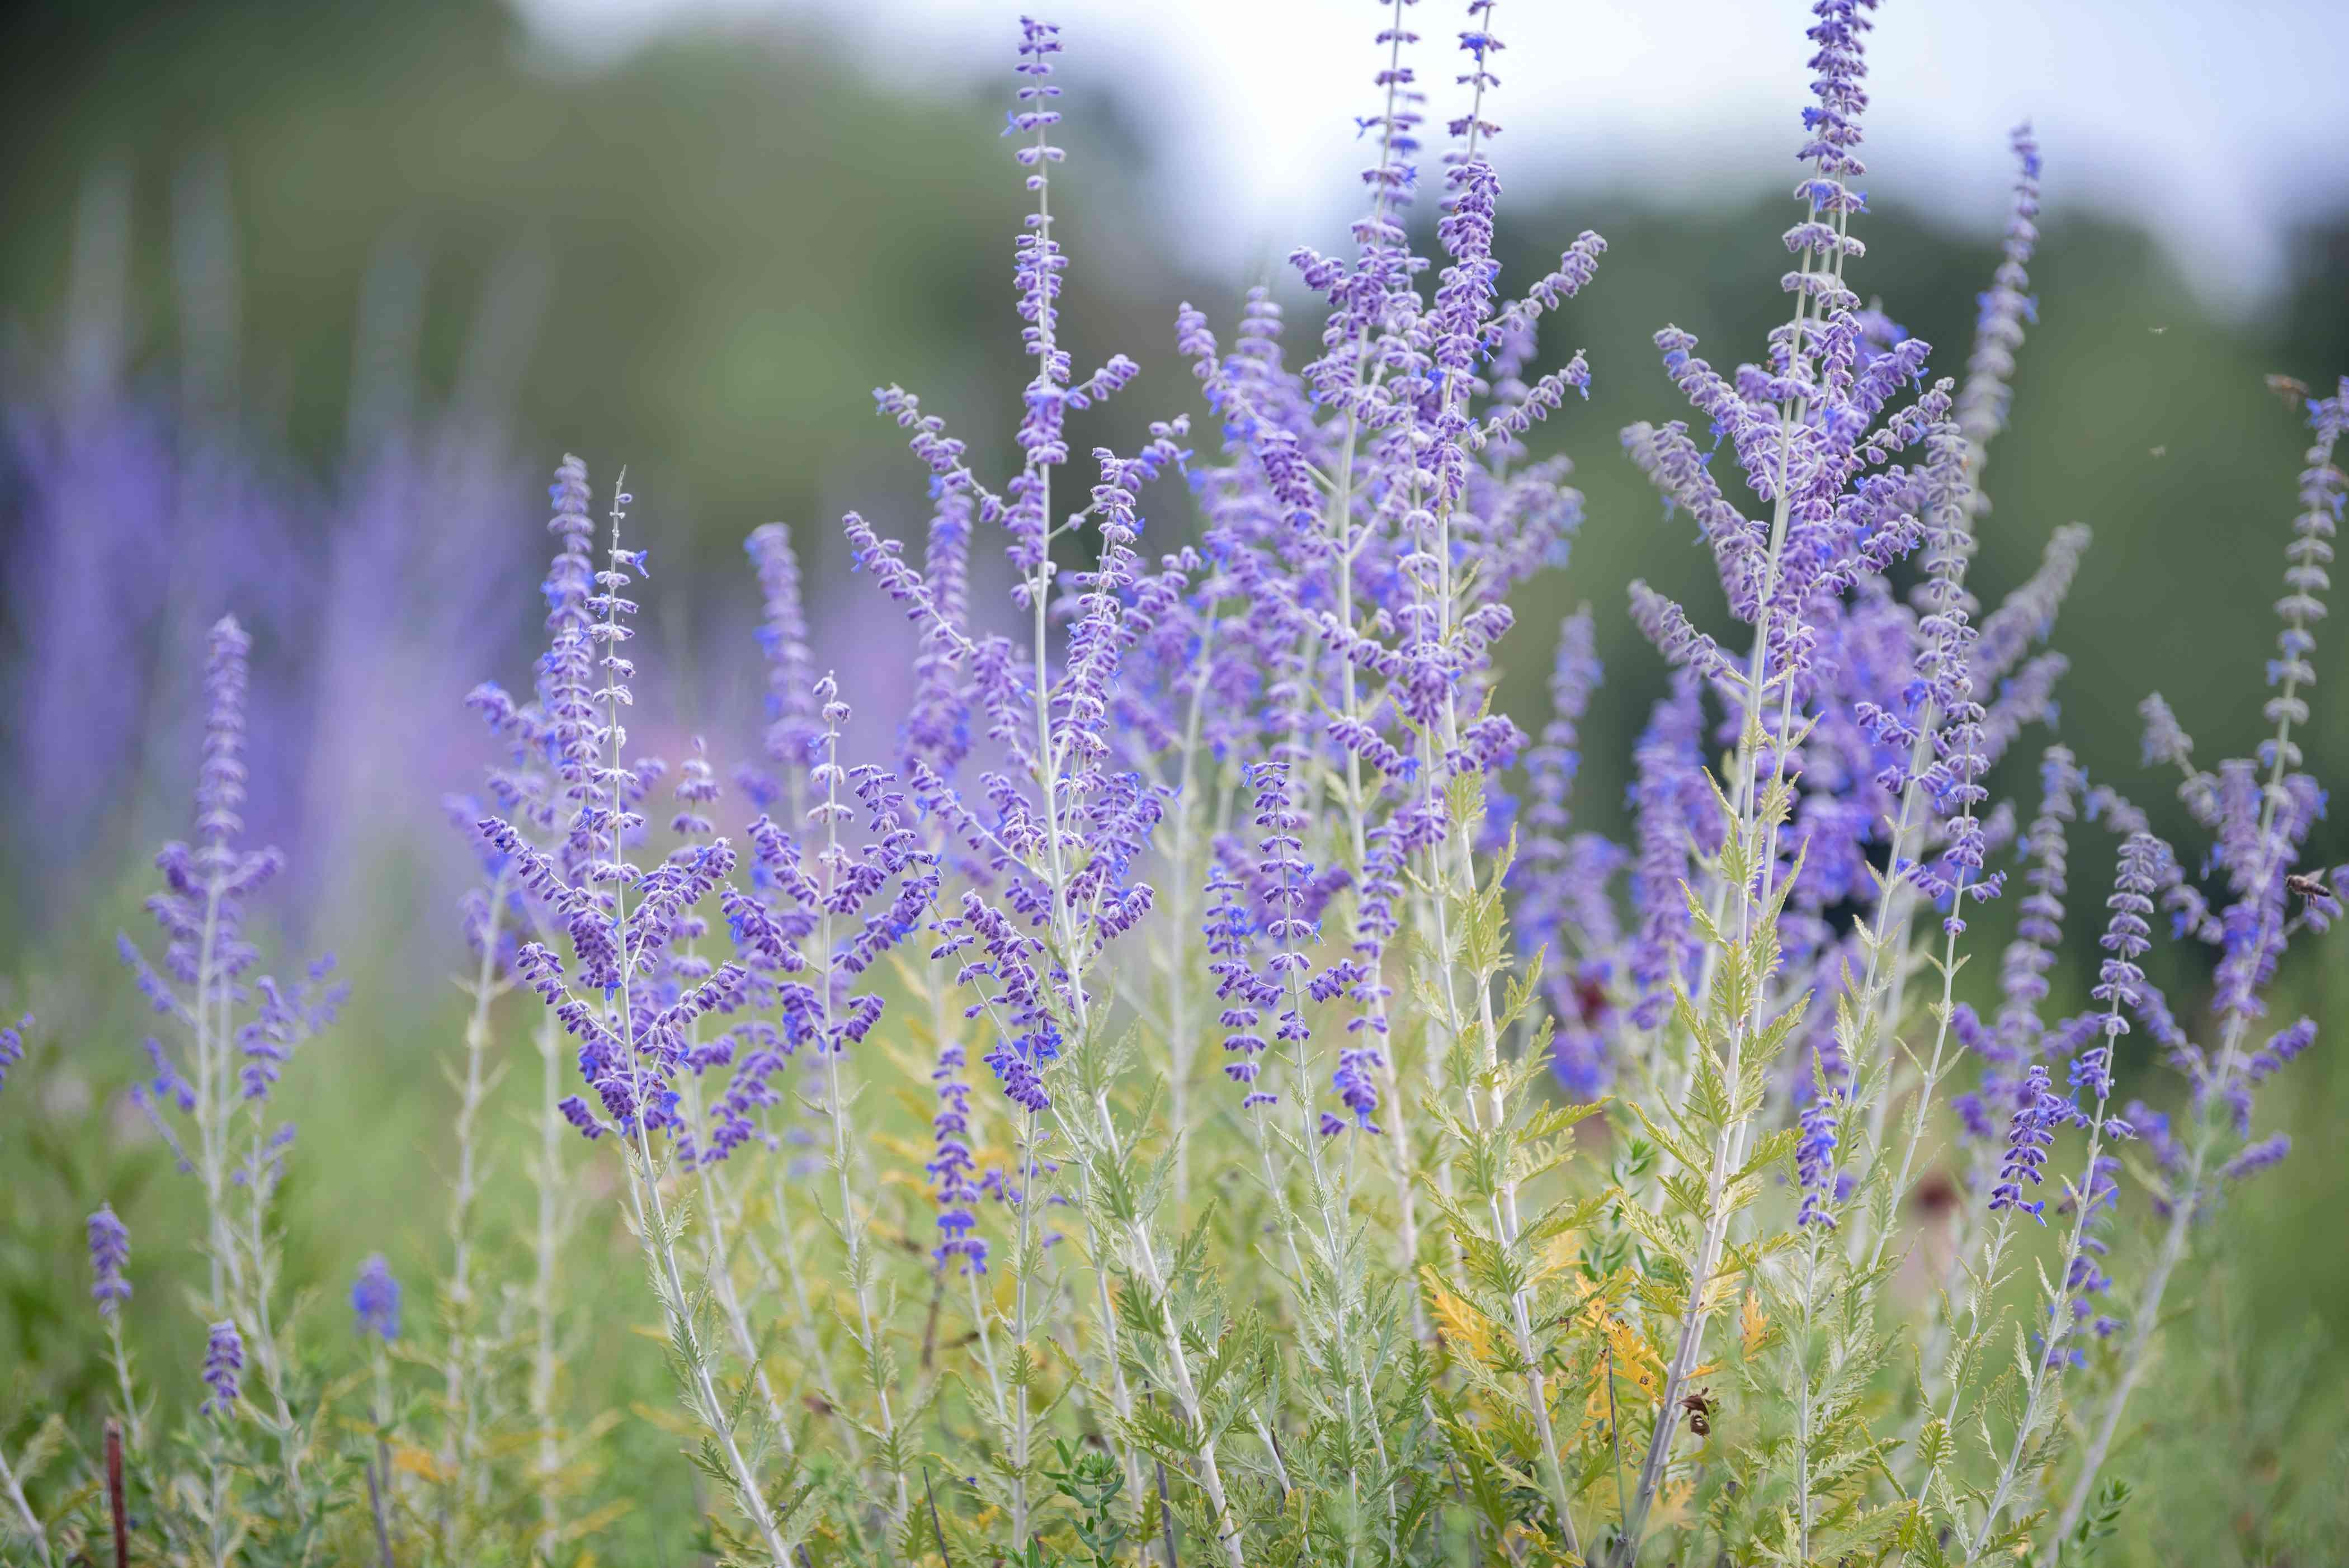 Russian sage shrub stems with silvery-green leaves below purple flower stalks closeup